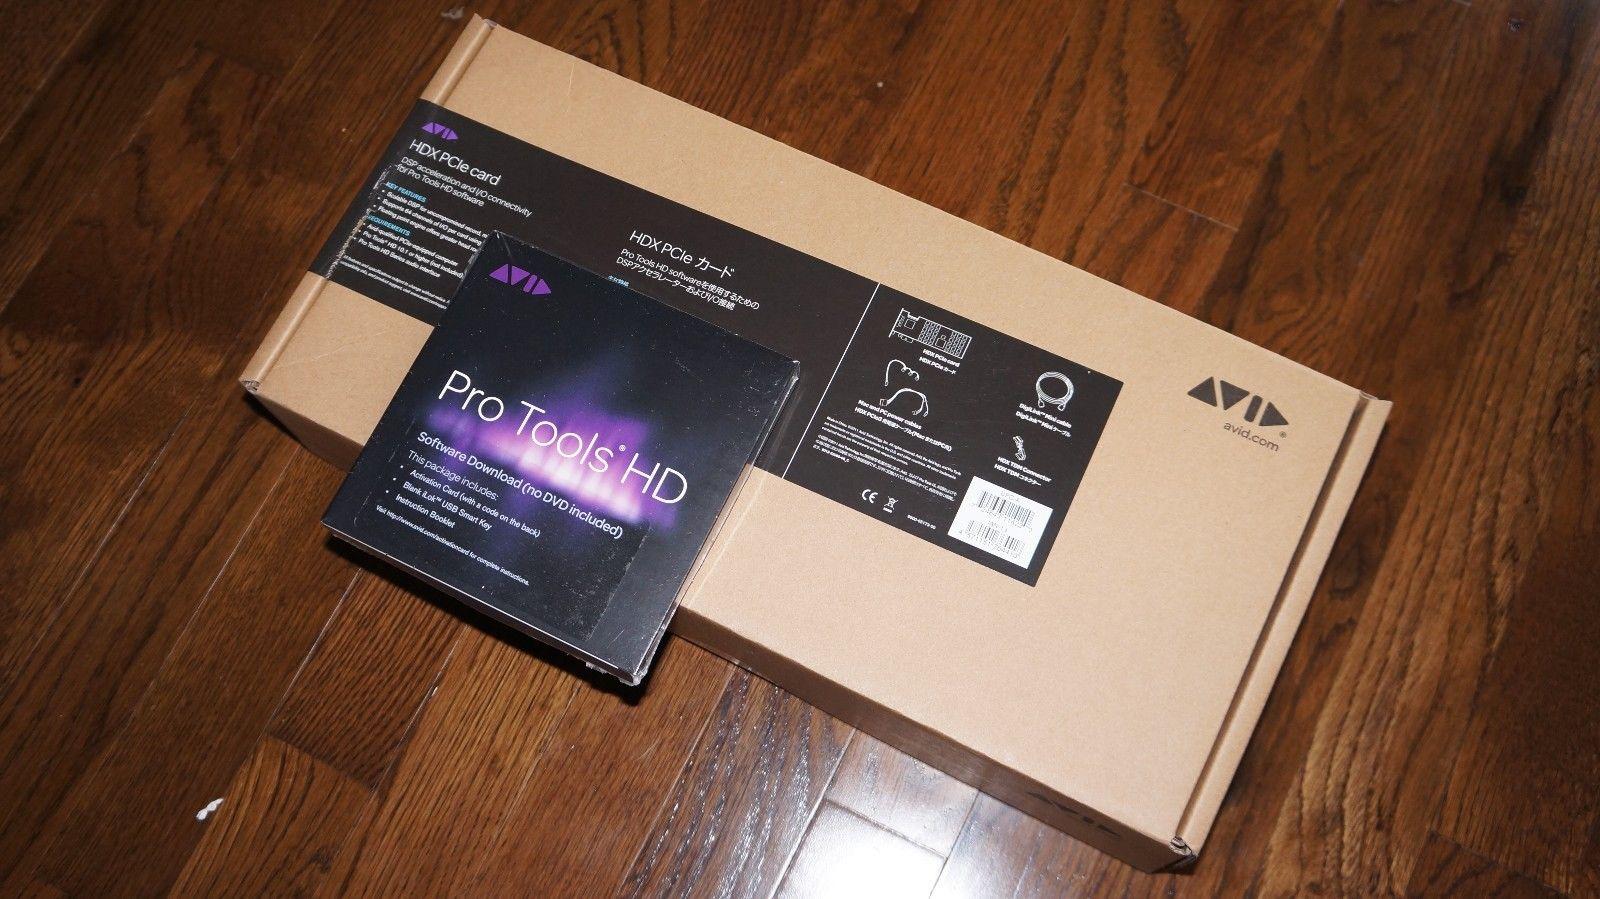 Avid pro tools 11 hd x64 vs x86